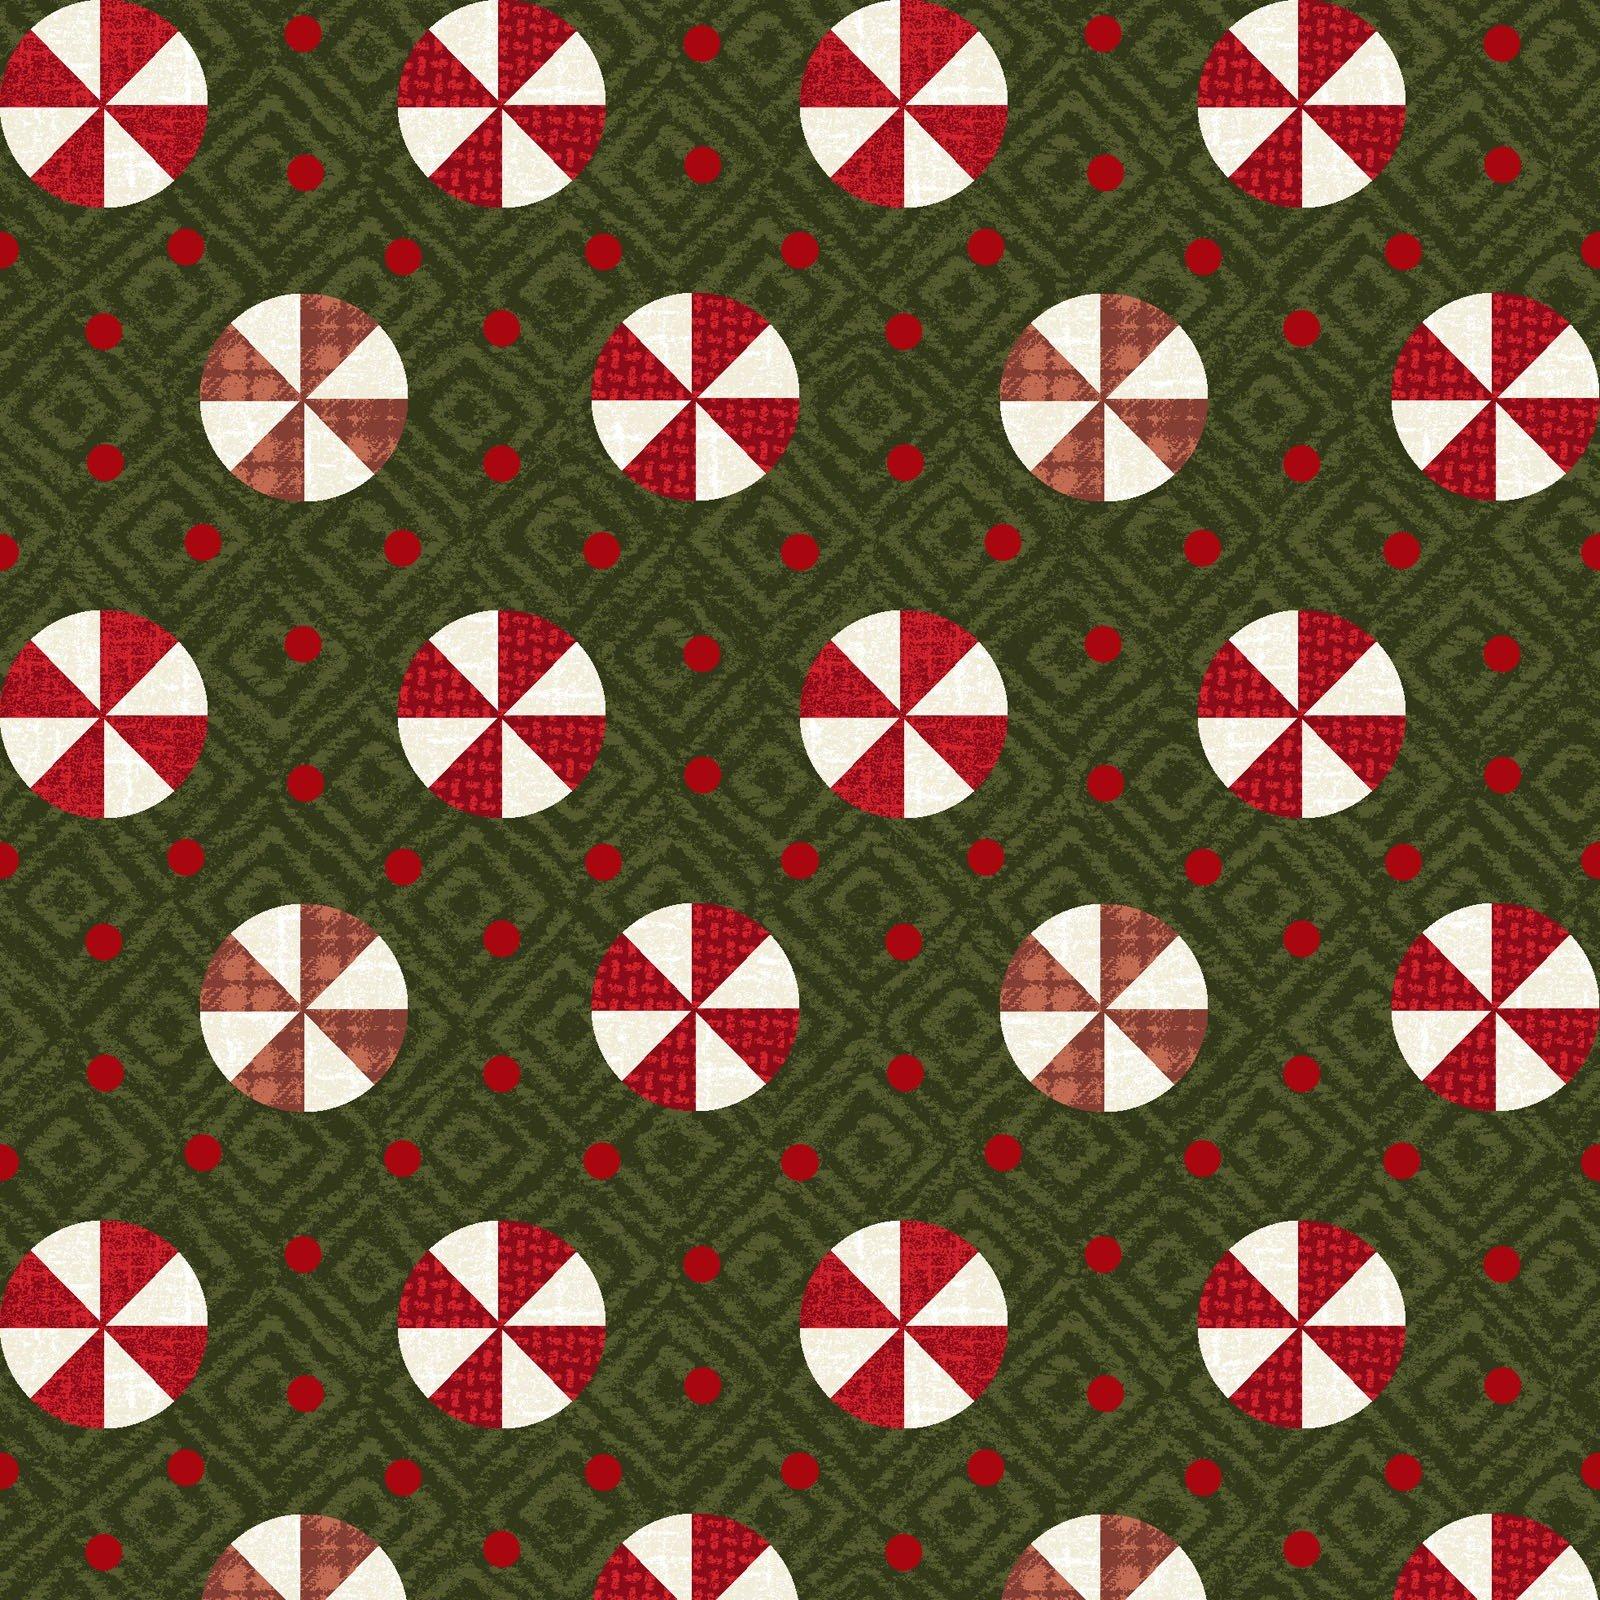 Snowdays Flannel - Peppermint 9936 G Green